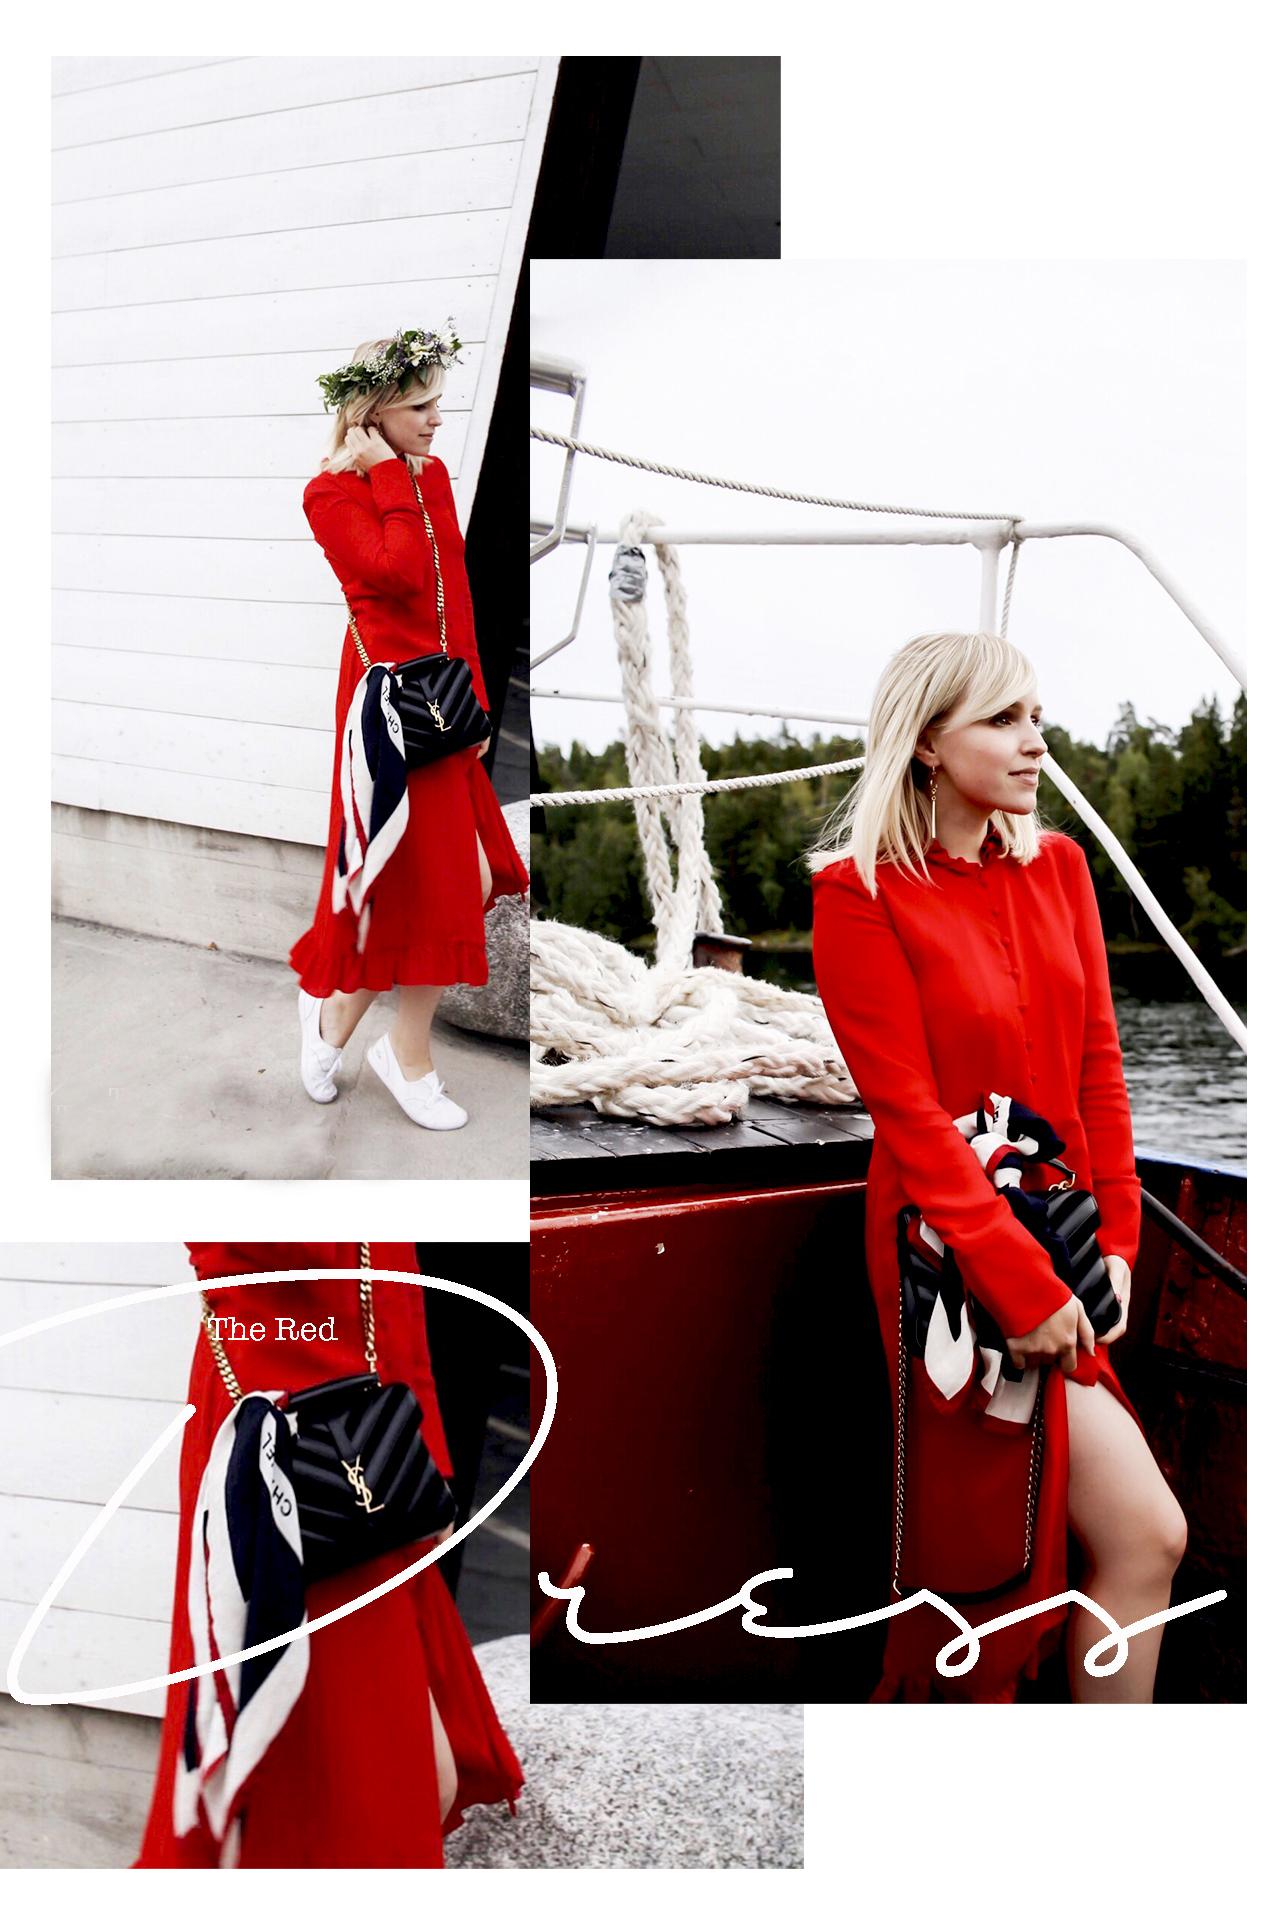 rotes Kleid YSL Midikleid chanel Vintage